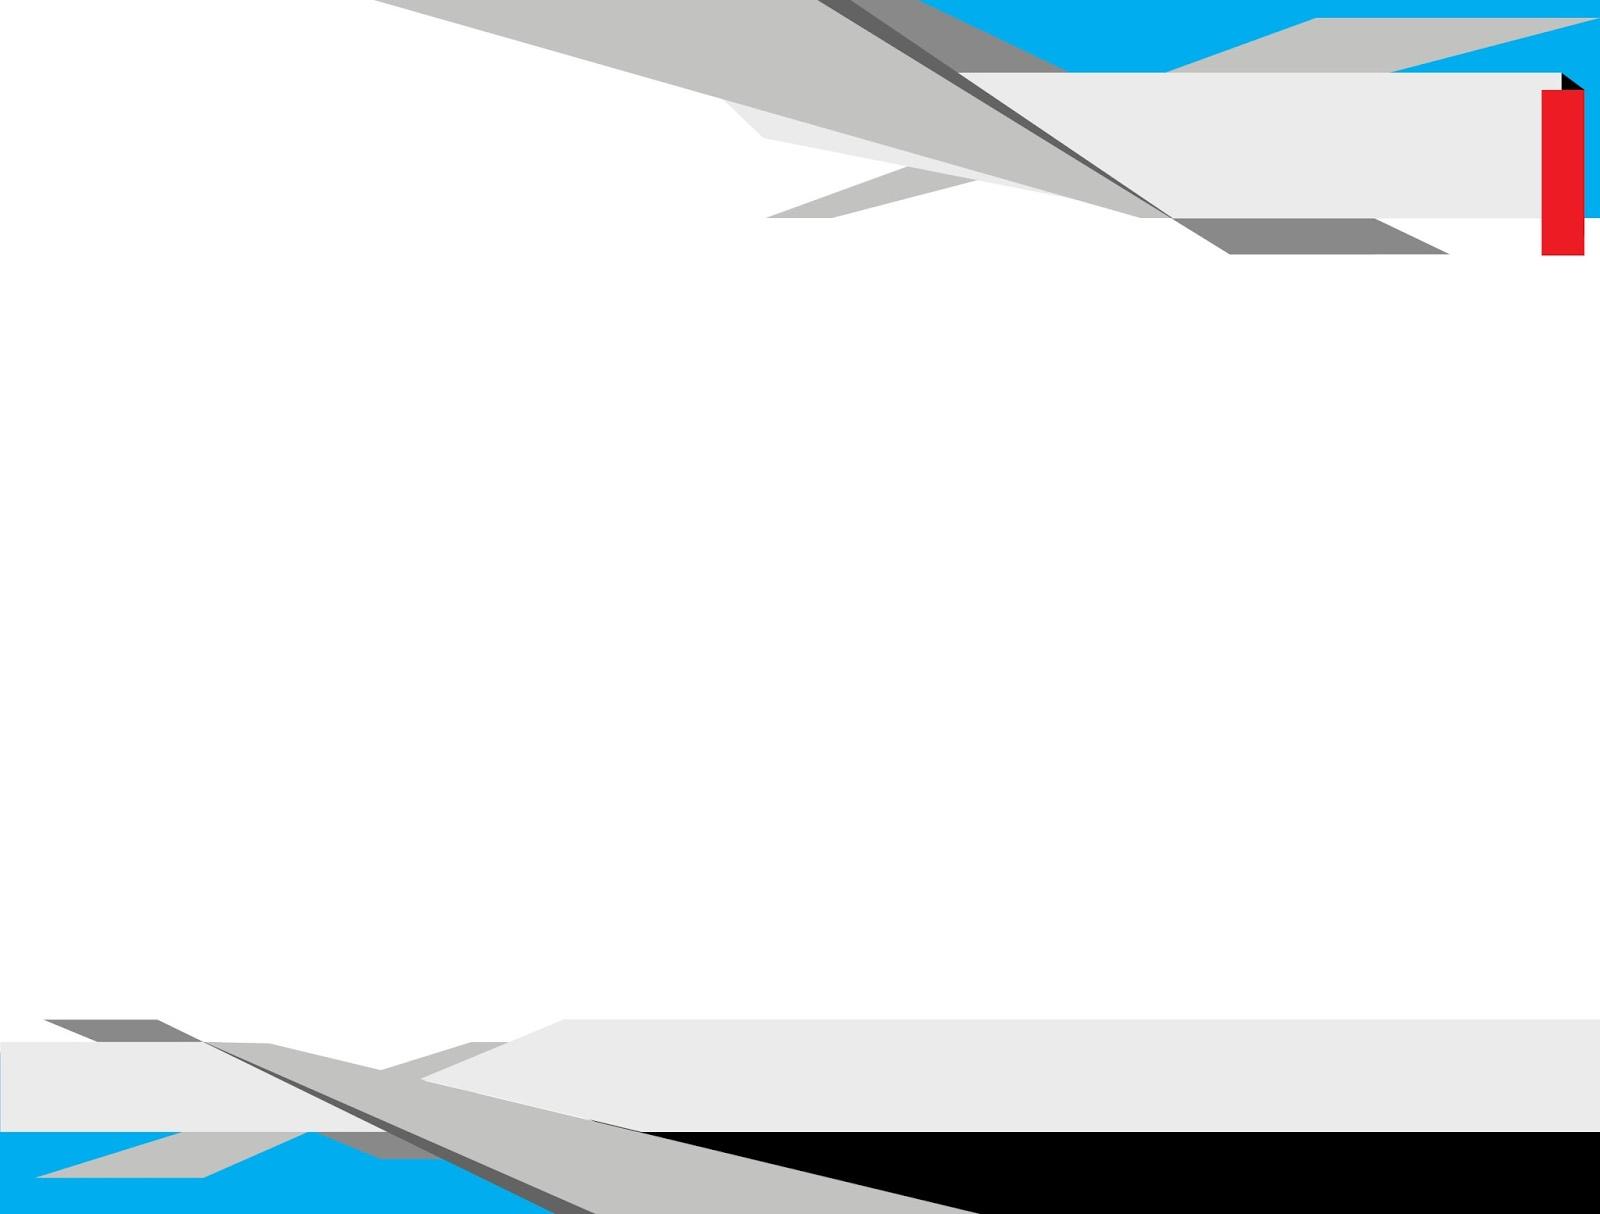 Background Spanduk Putih Related Keywords - Background Banner Putih Hd -  1600x1214 - Download HD Wallpaper - WallpaperTip